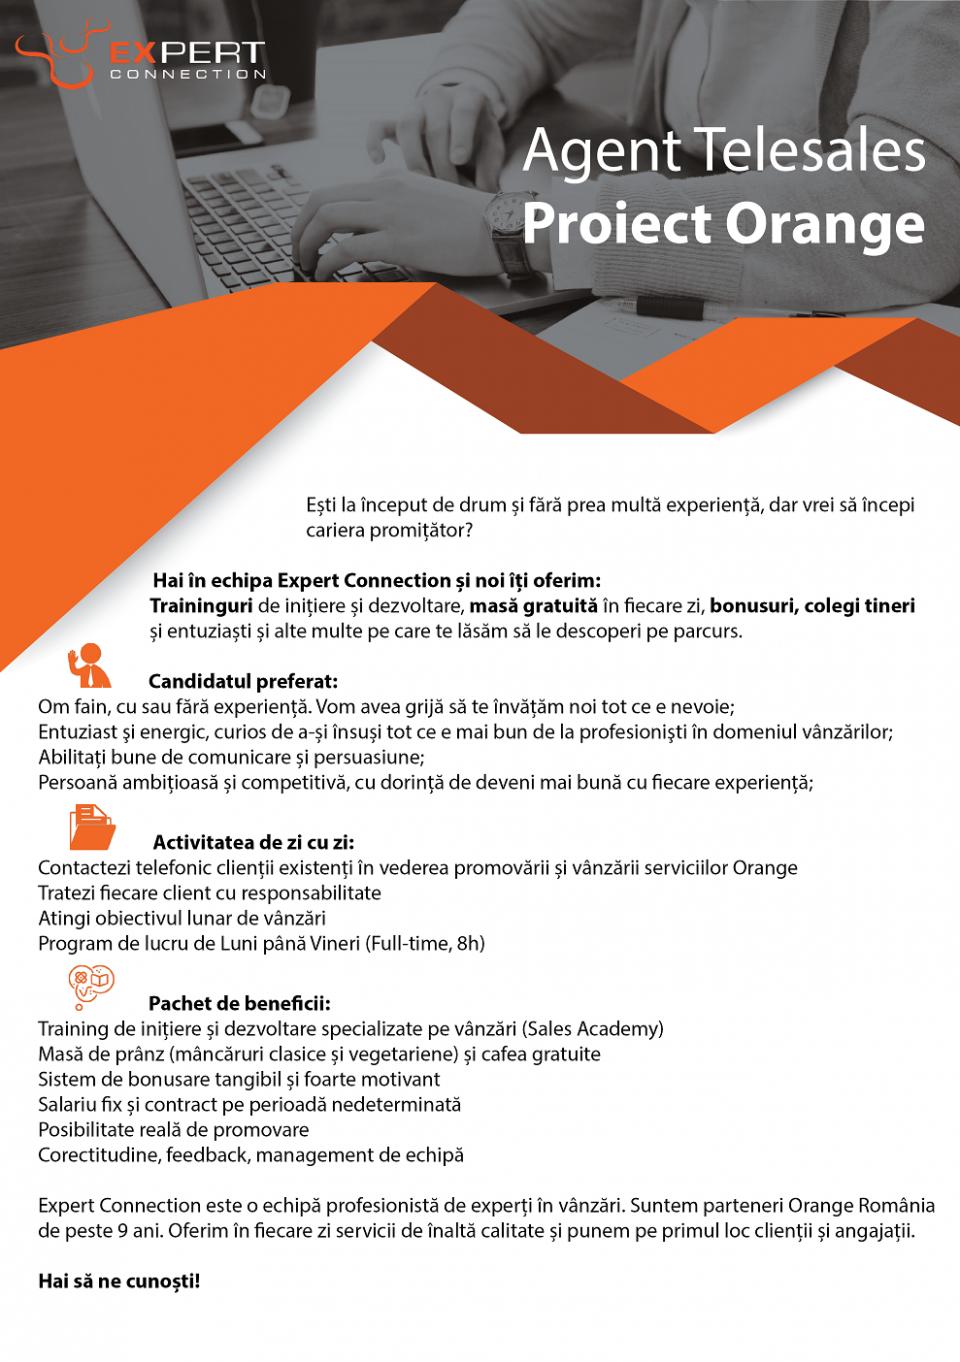 Agent Telesales – Proiect Orange